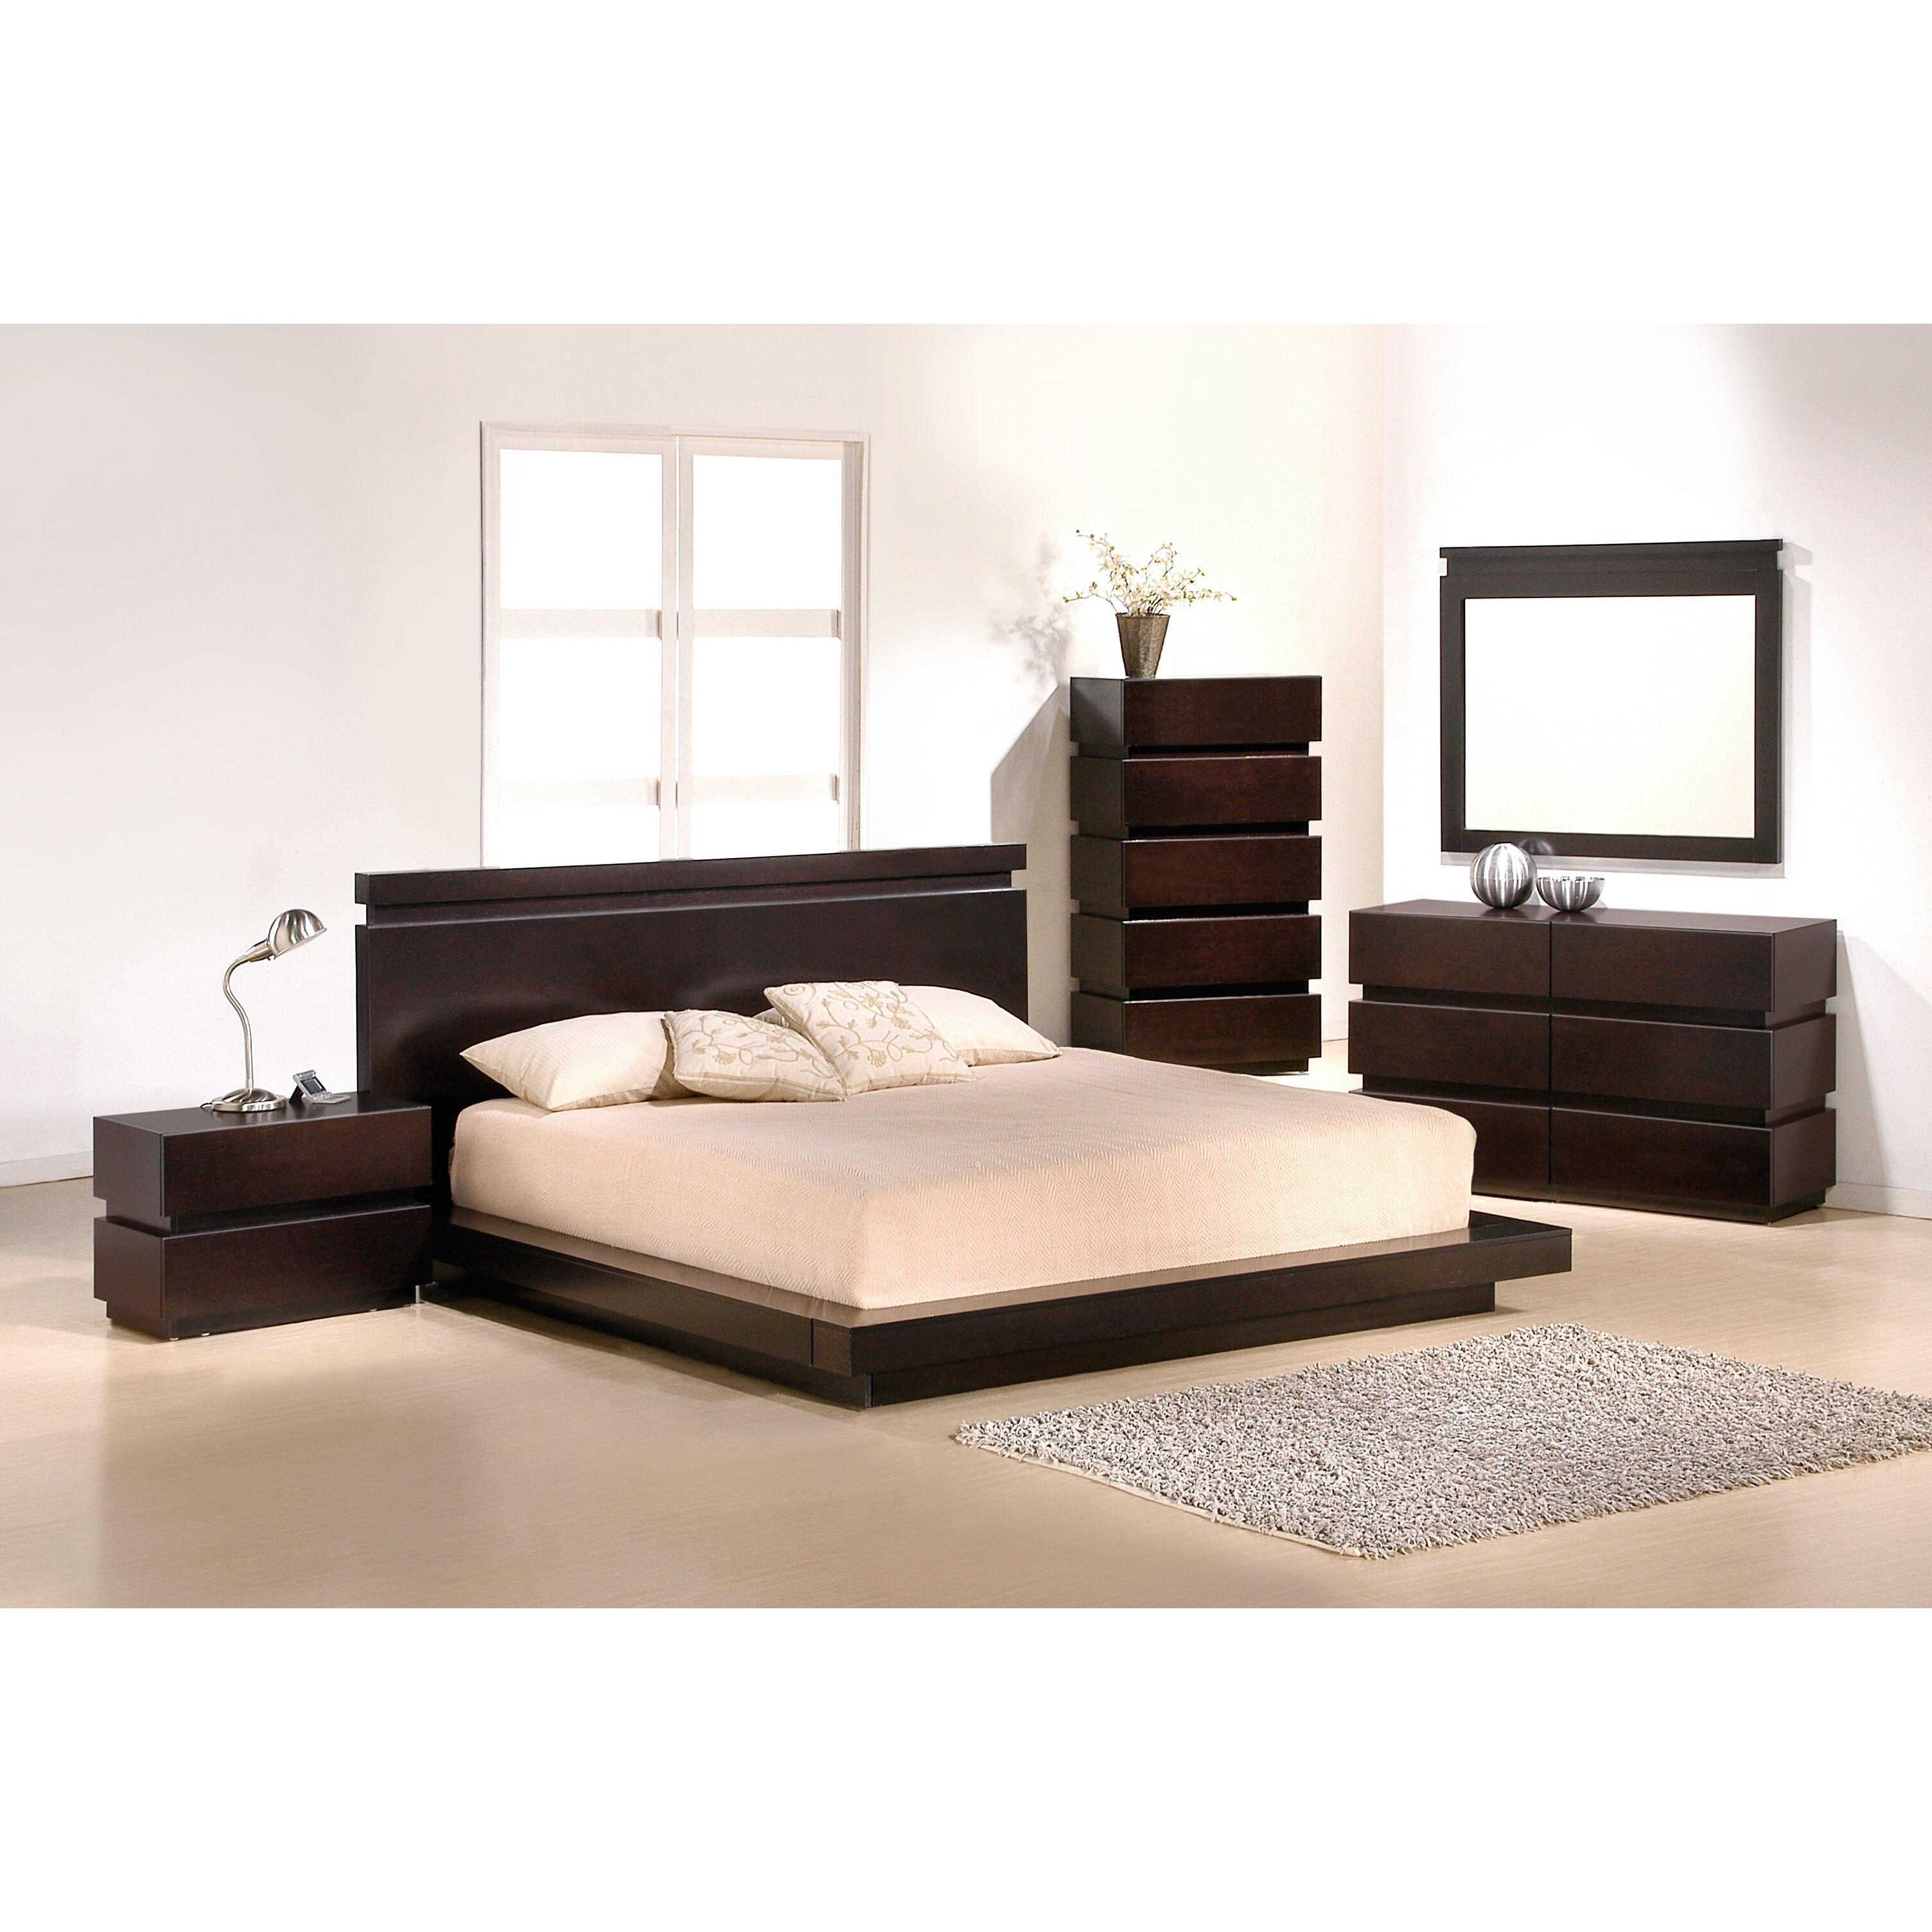 J M Furniture Knotch Nightstand Reviews Wayfair